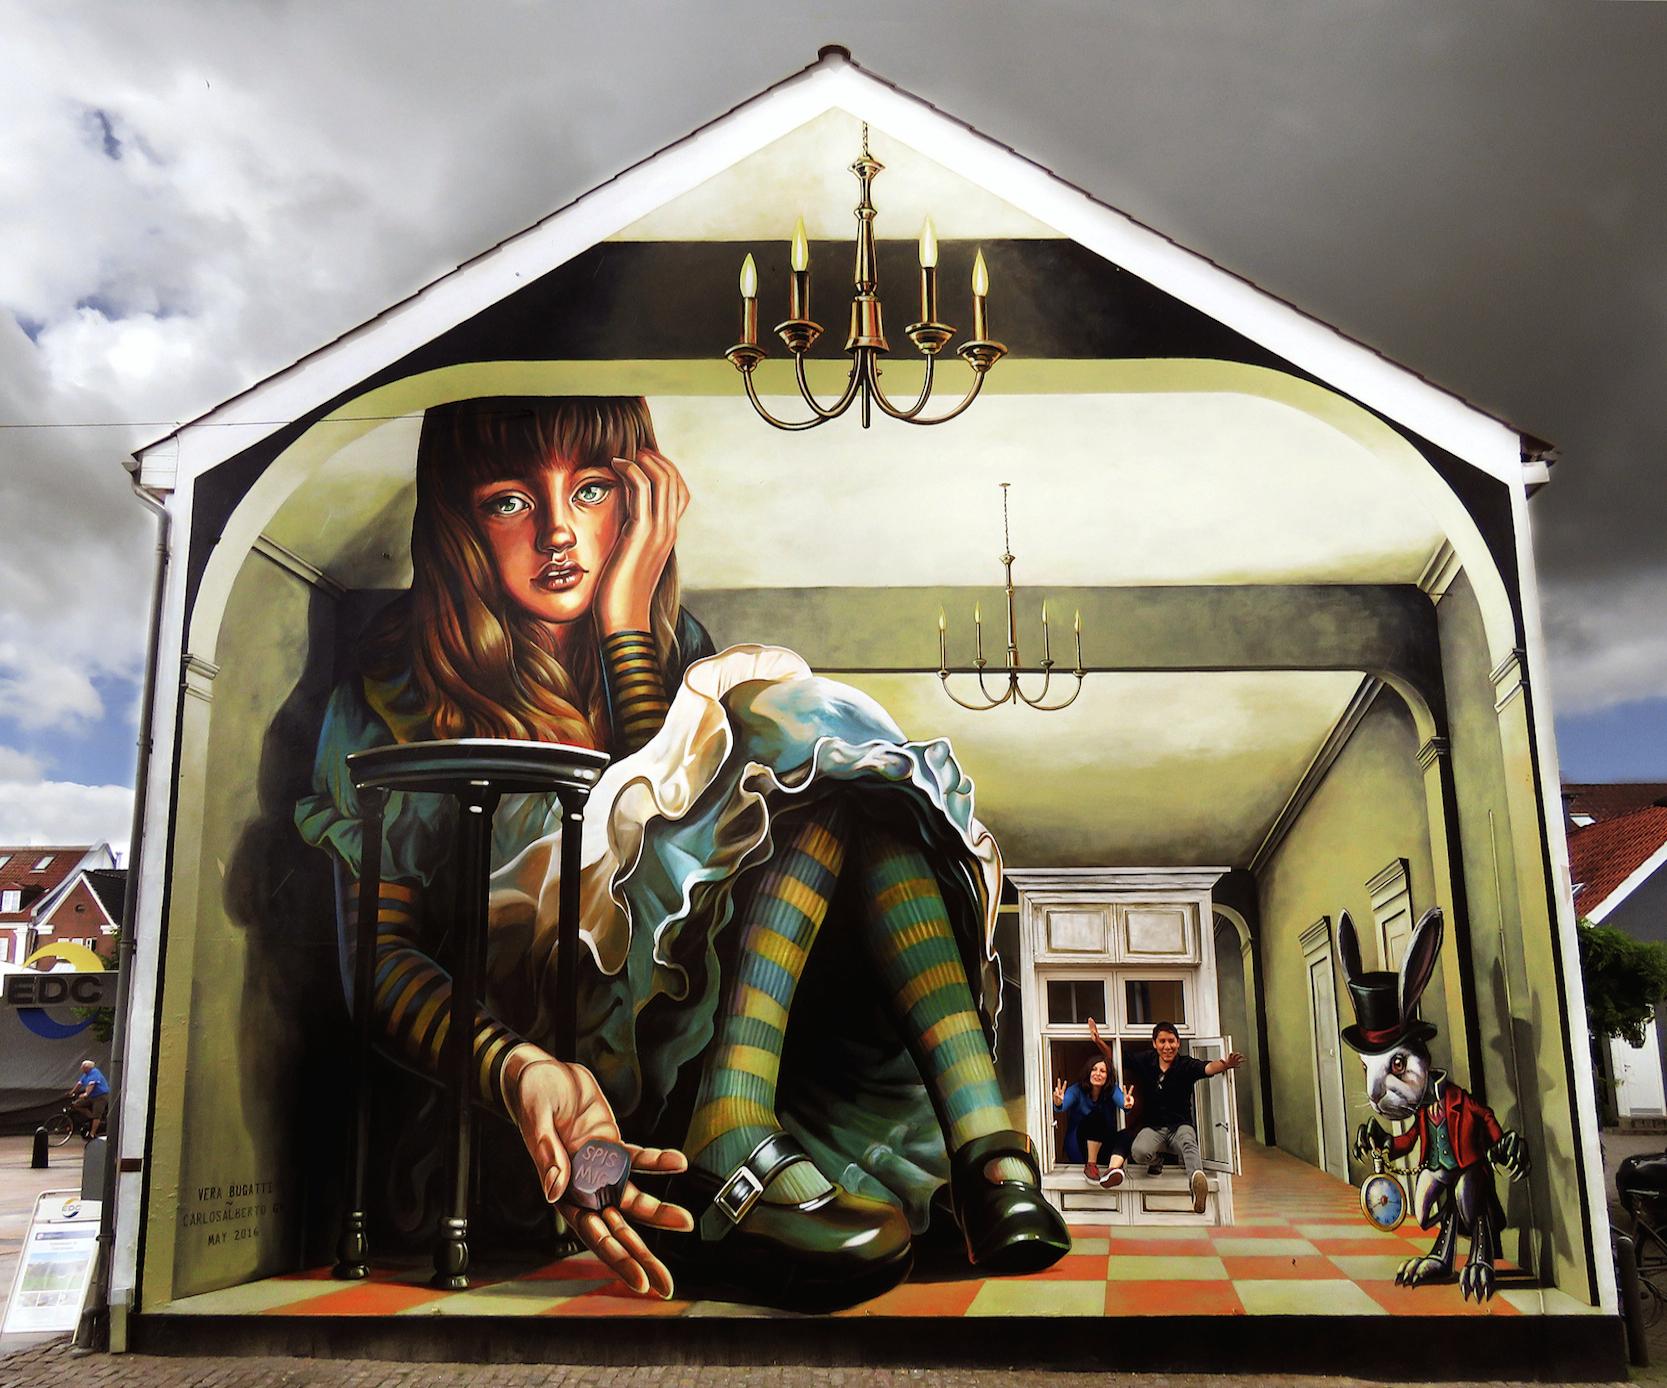 verabugatti streetart murals walls arteurbana illusioniottiche 3Dstreetart aliceinwonderland alice carroll illusioniottiche brandestreetart spismig mangiami narrow floatingdoors